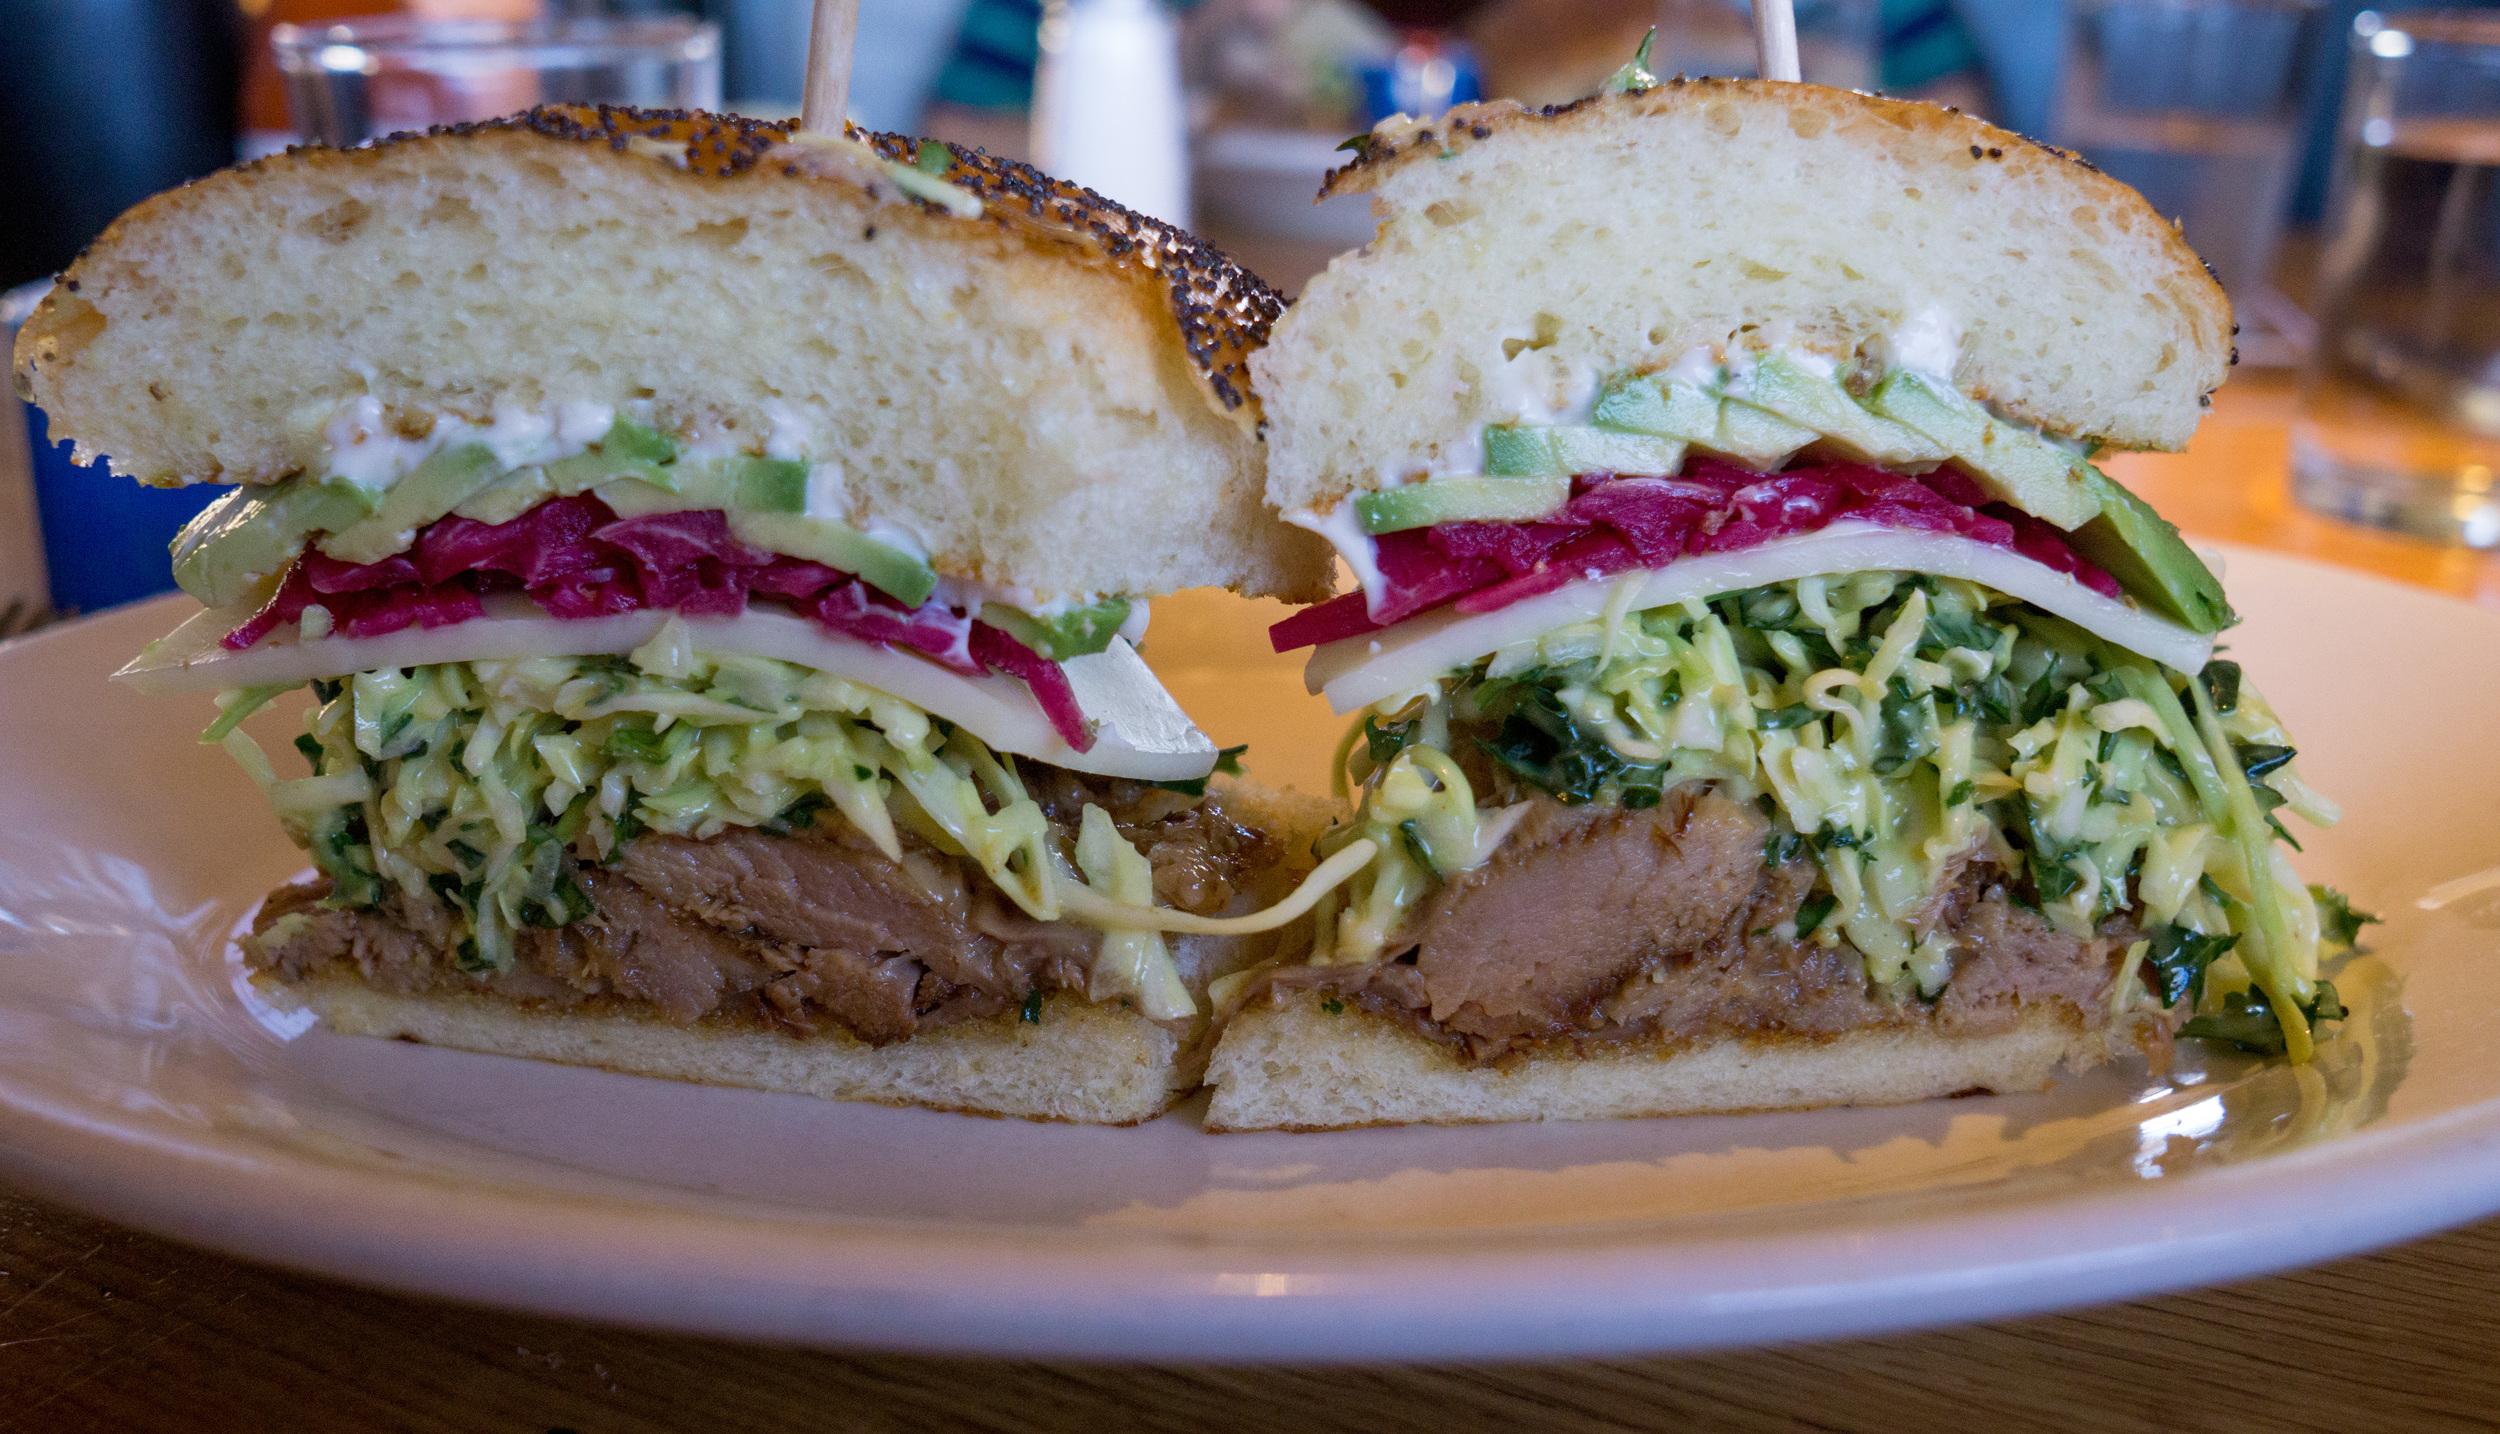 The Carnitas Sandwich is a definite winner.